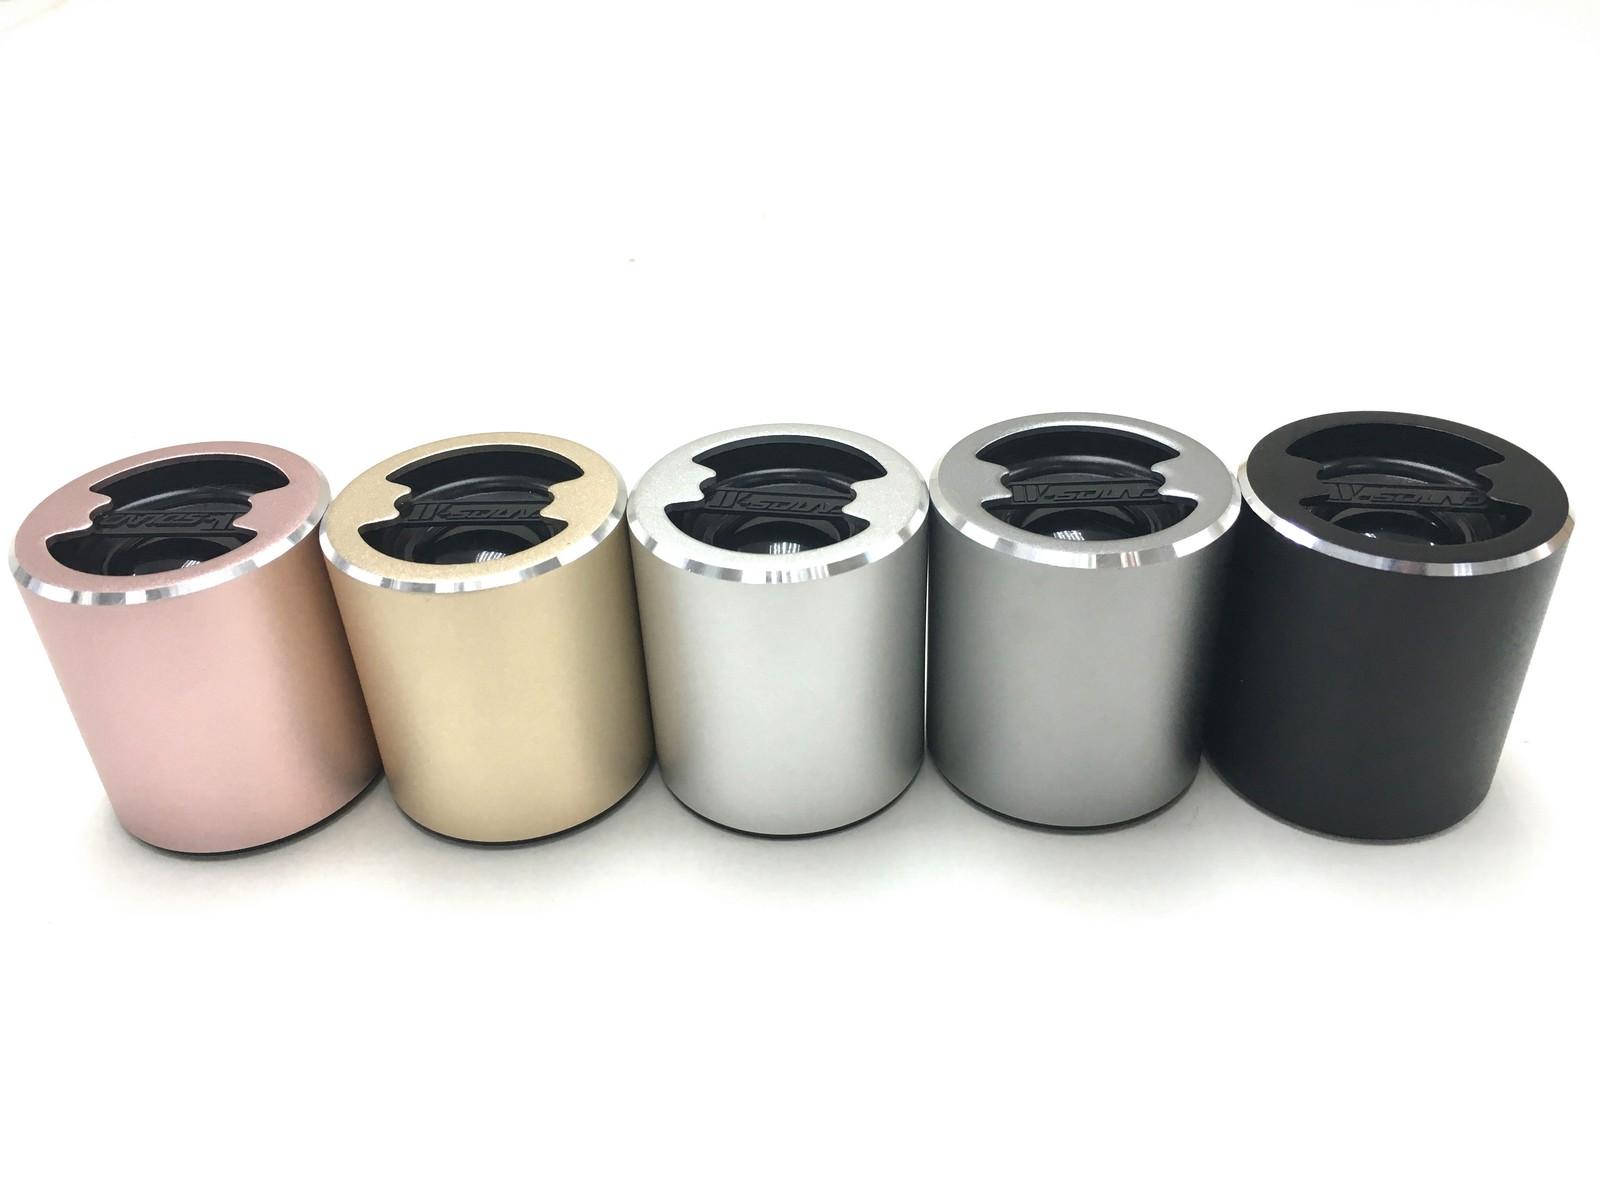 Professional design wireless bluetooth speakers